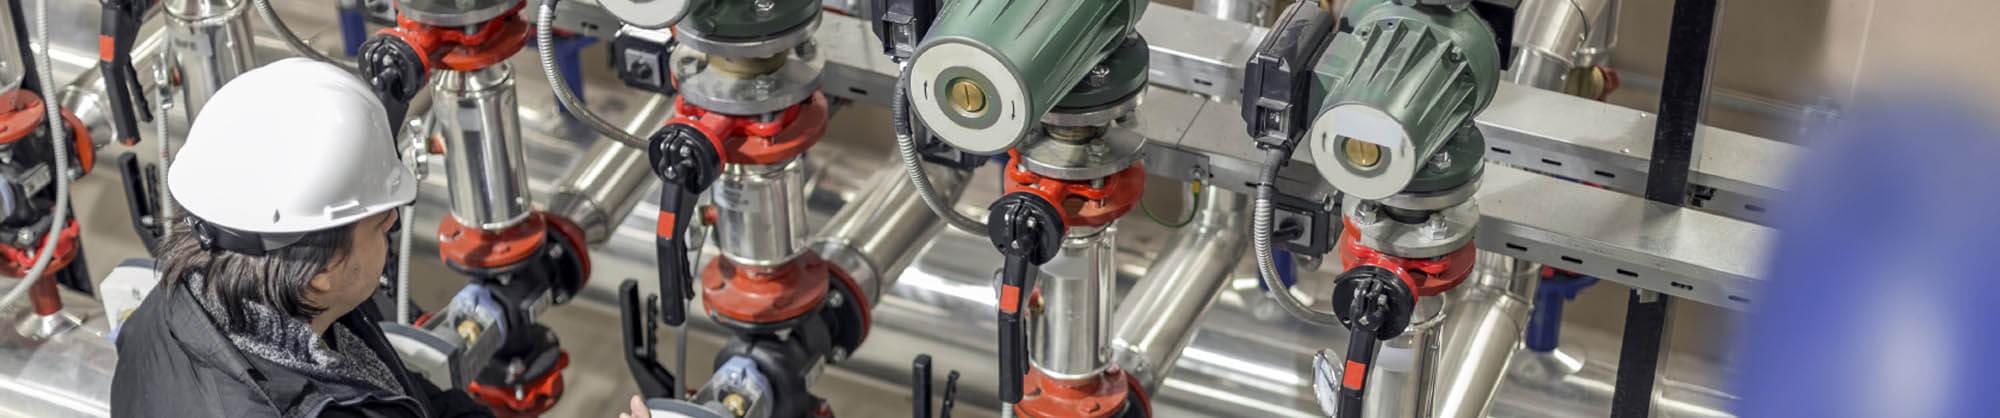 Industrial Pump Service, Repair & Distribution